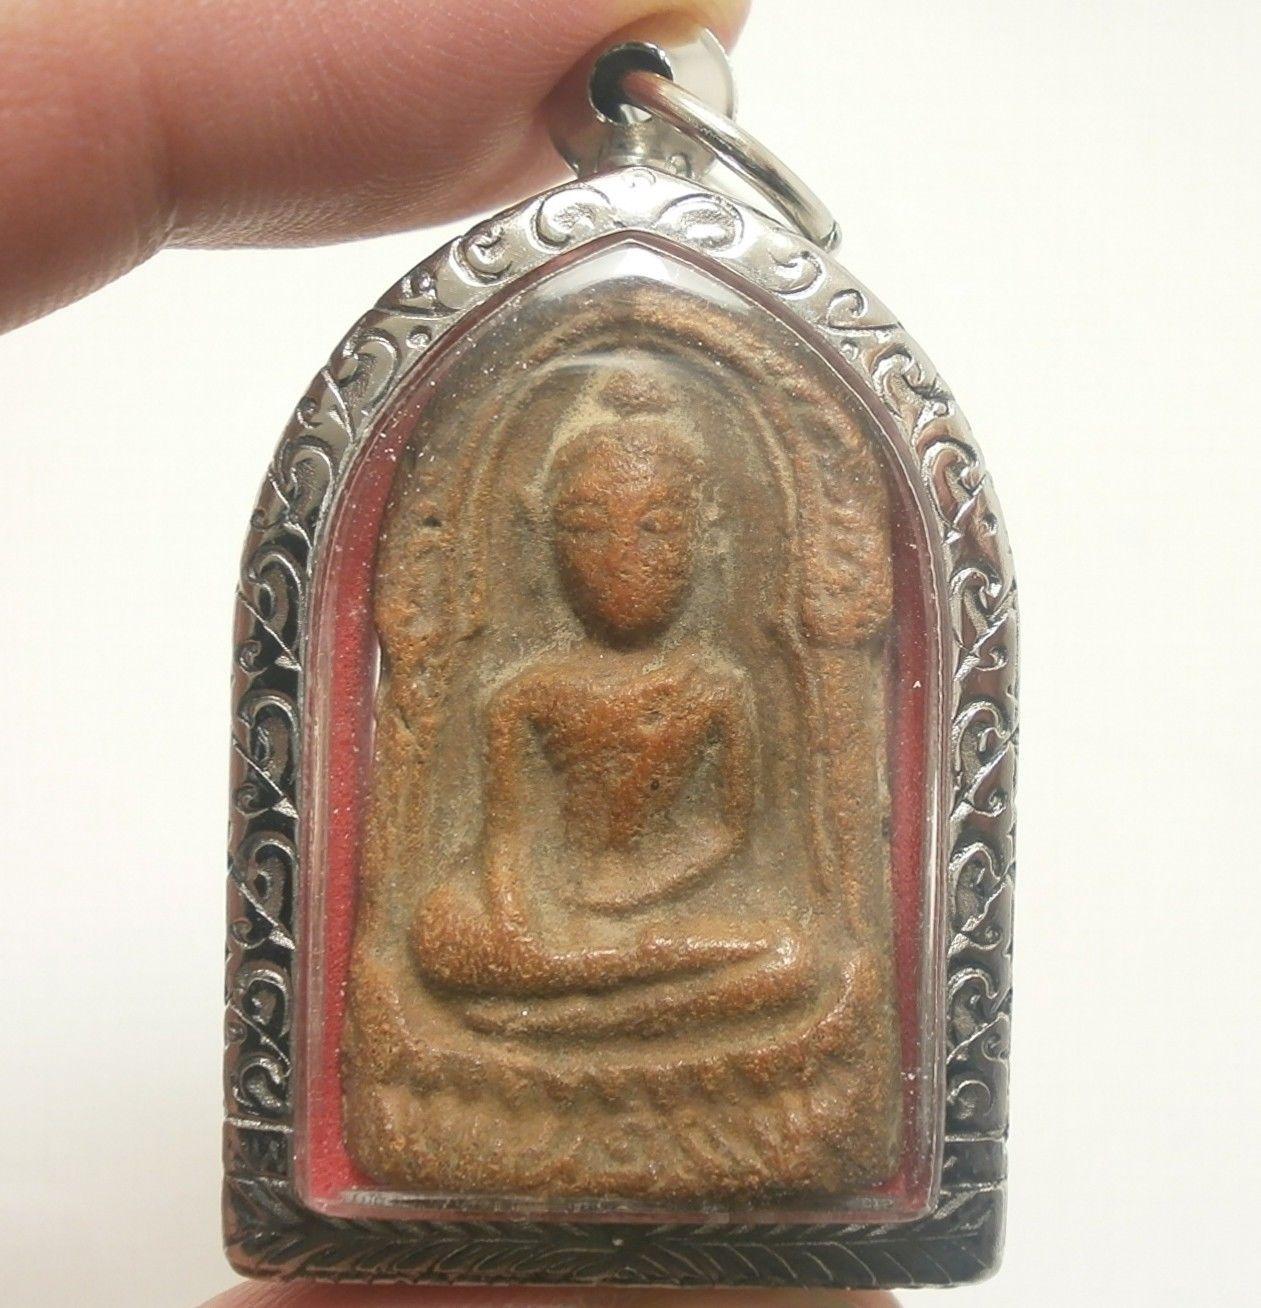 PHRA SOOMGOR MONEY RICH LUCKY HAPPY PEACEFUL LIFE THAI BUDDHA TOP AMULET PENDANT image 4